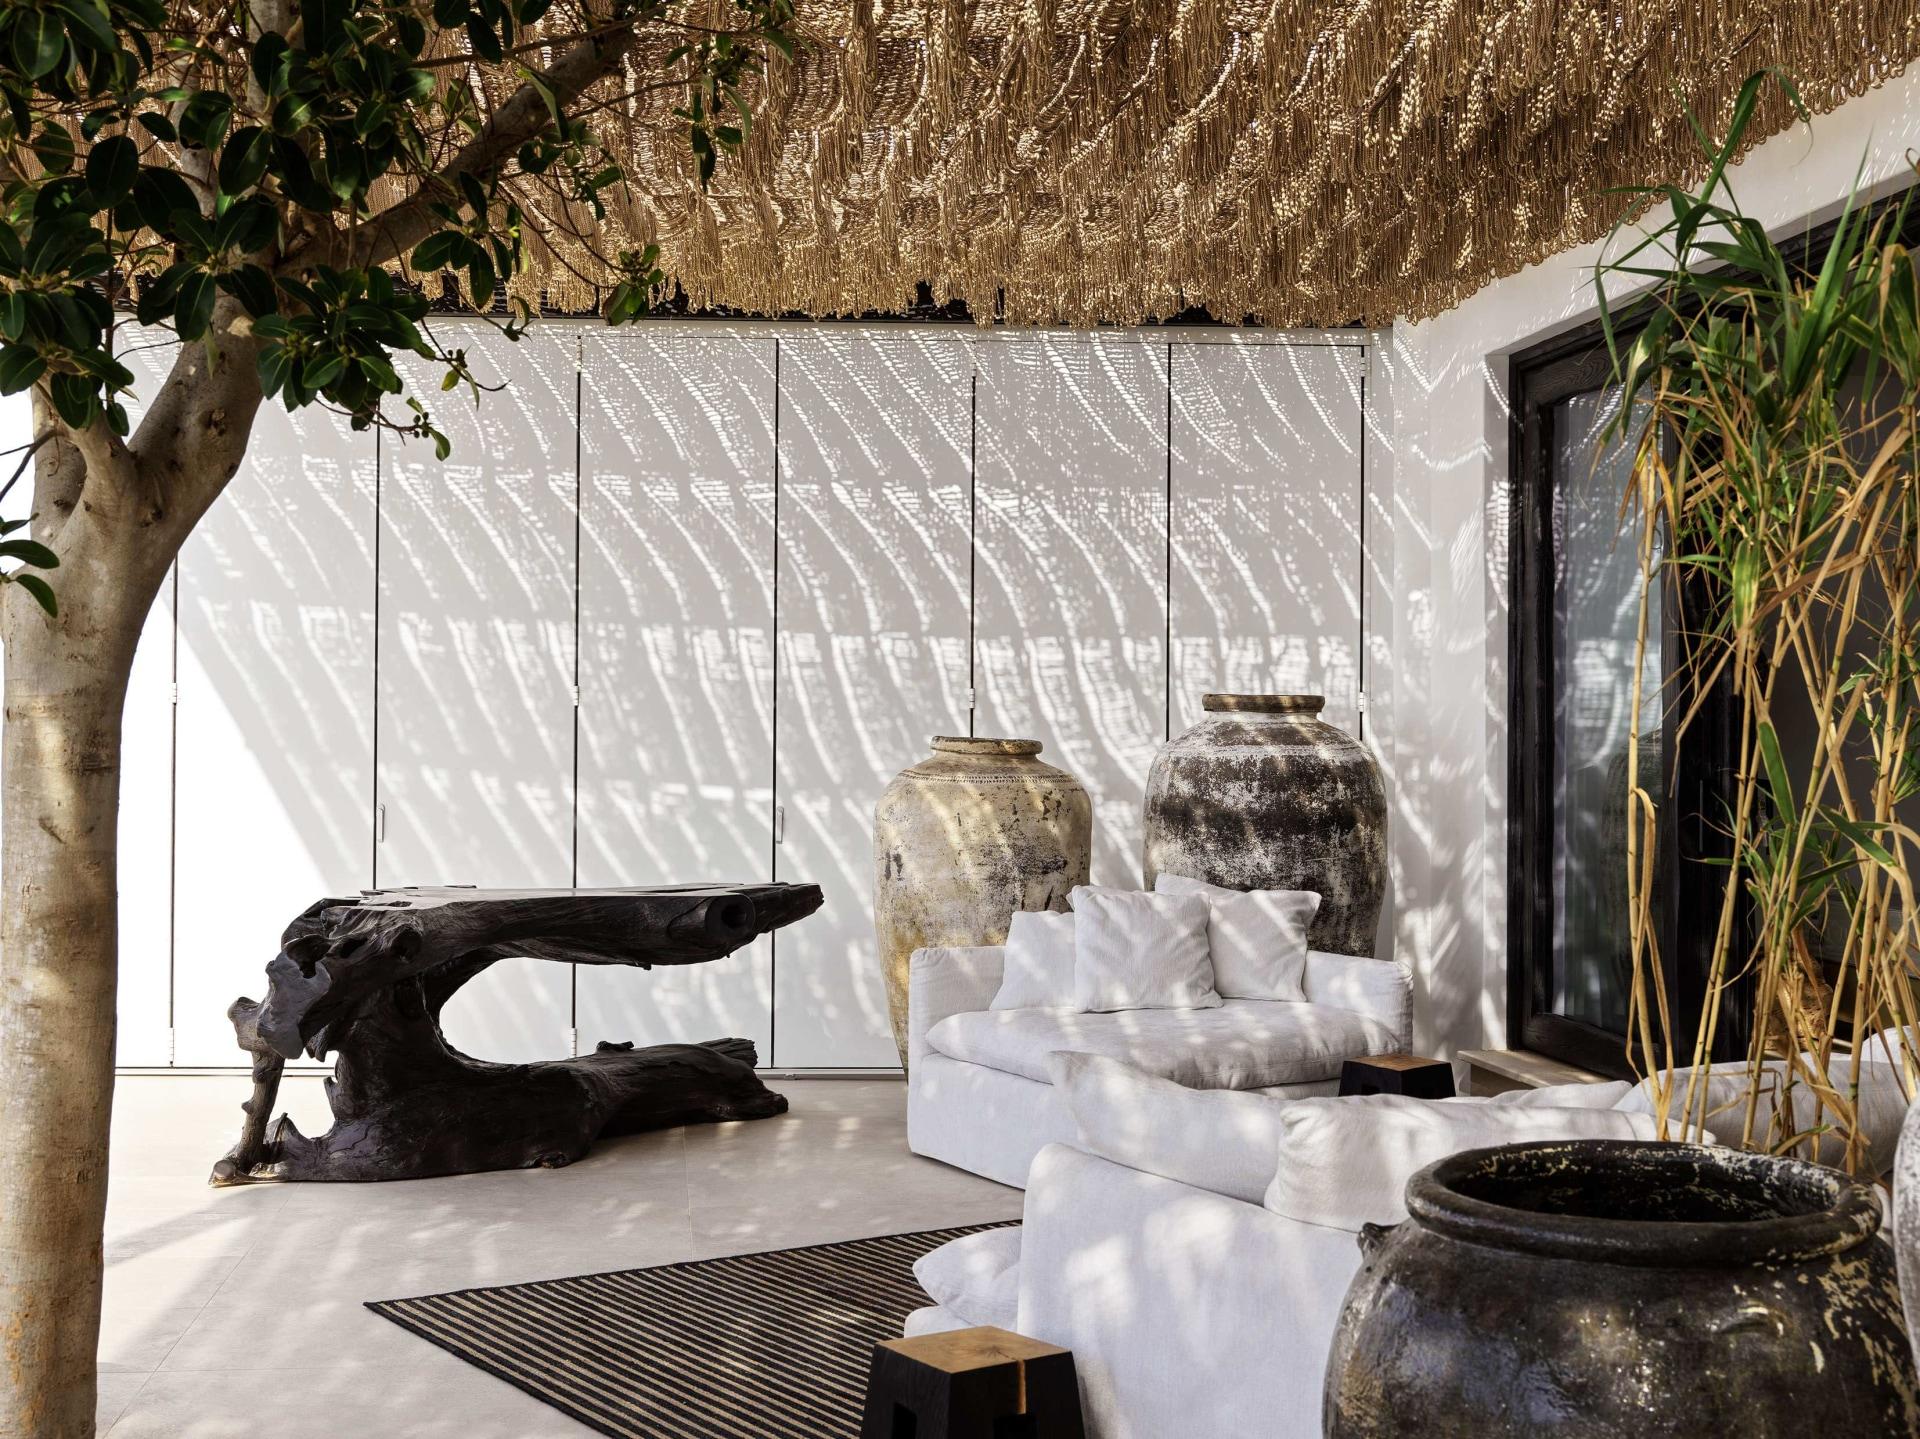 Terrasse des Honeymoon Retreats